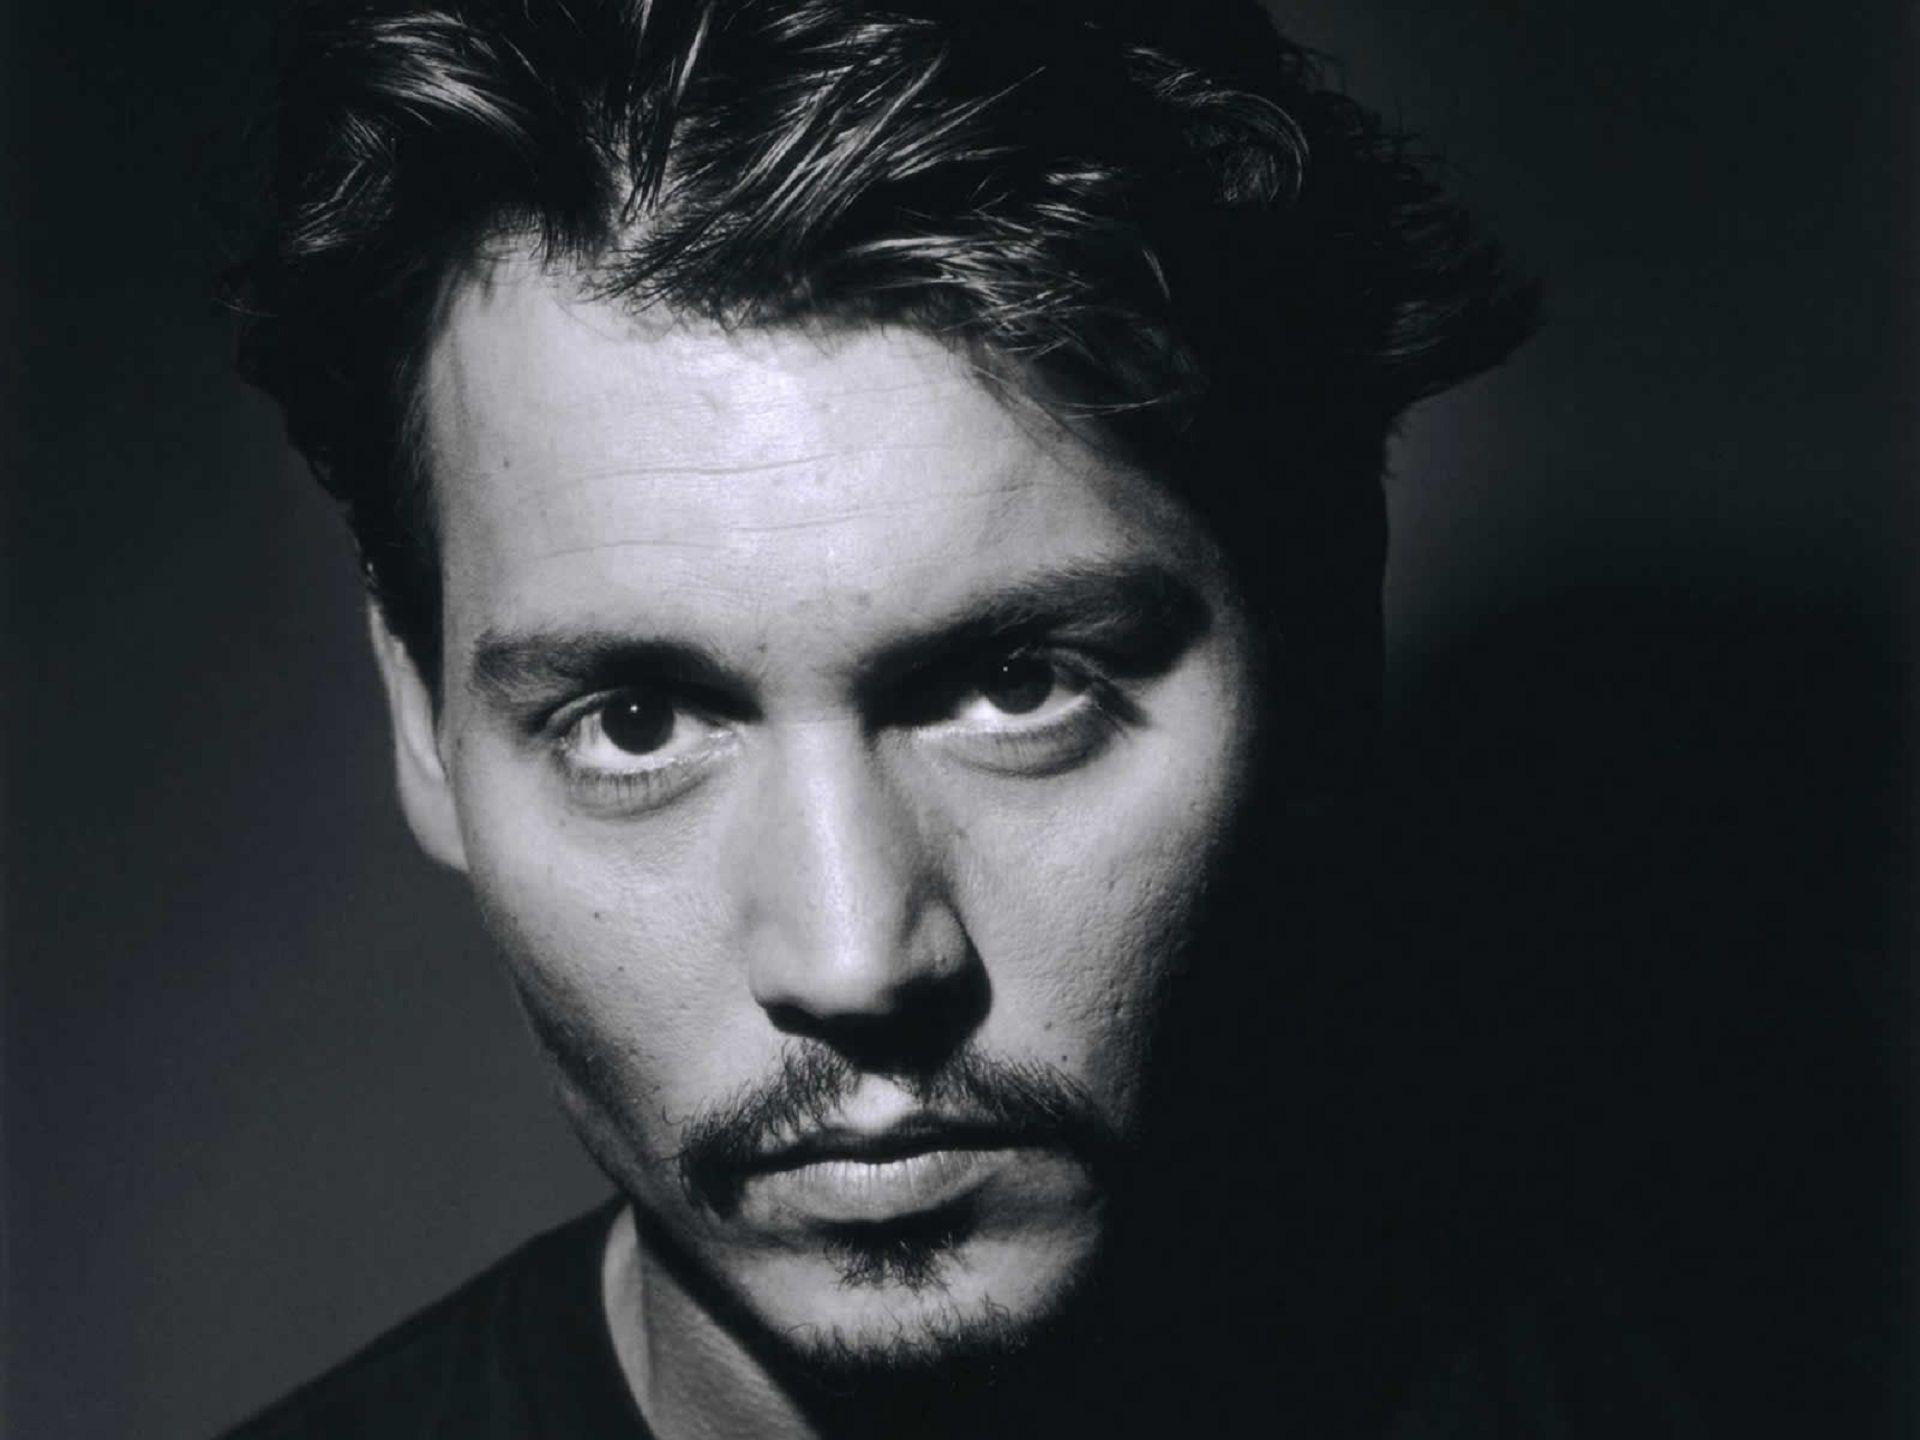 Johnny Depp Computer Wallpaper